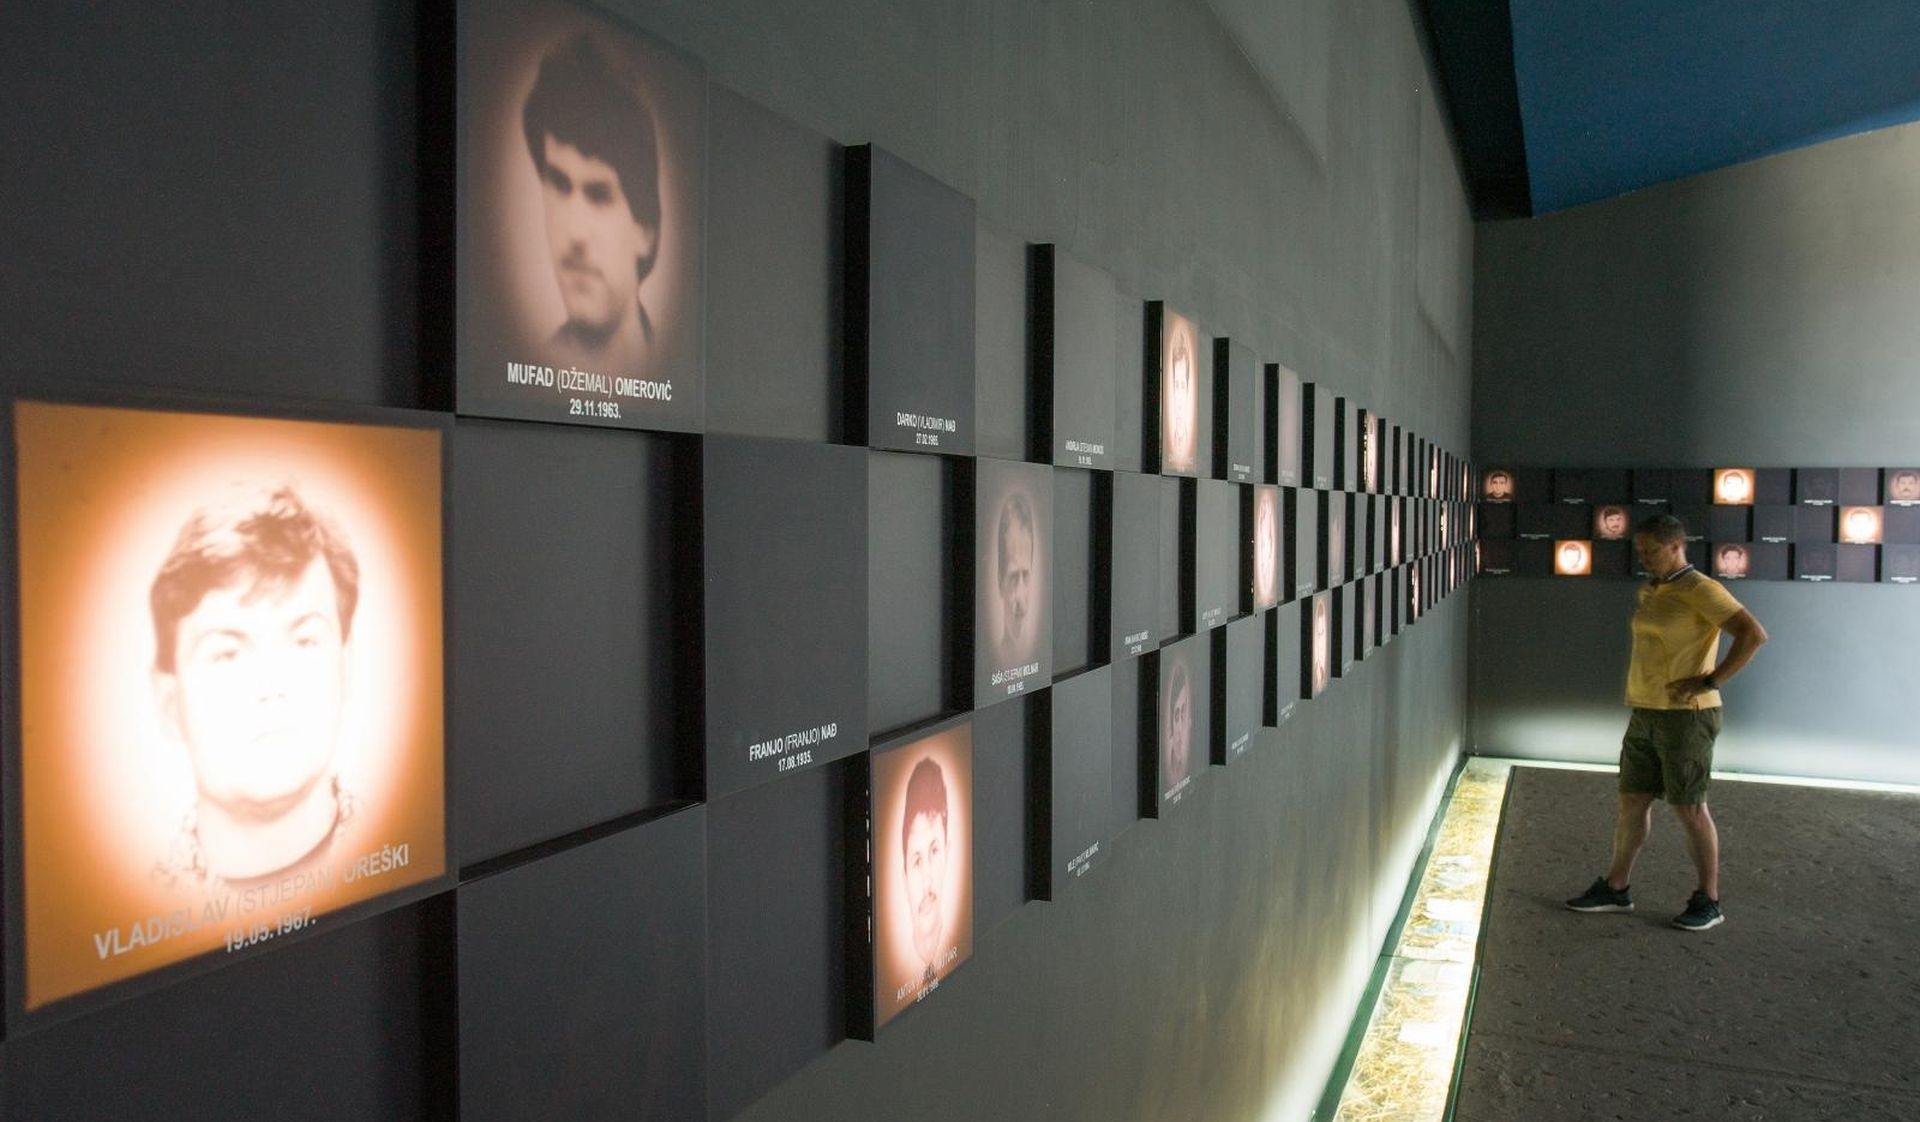 Pokrenuta istraga za ratni zločin protiv ratnih zarobljenika na Ovčari